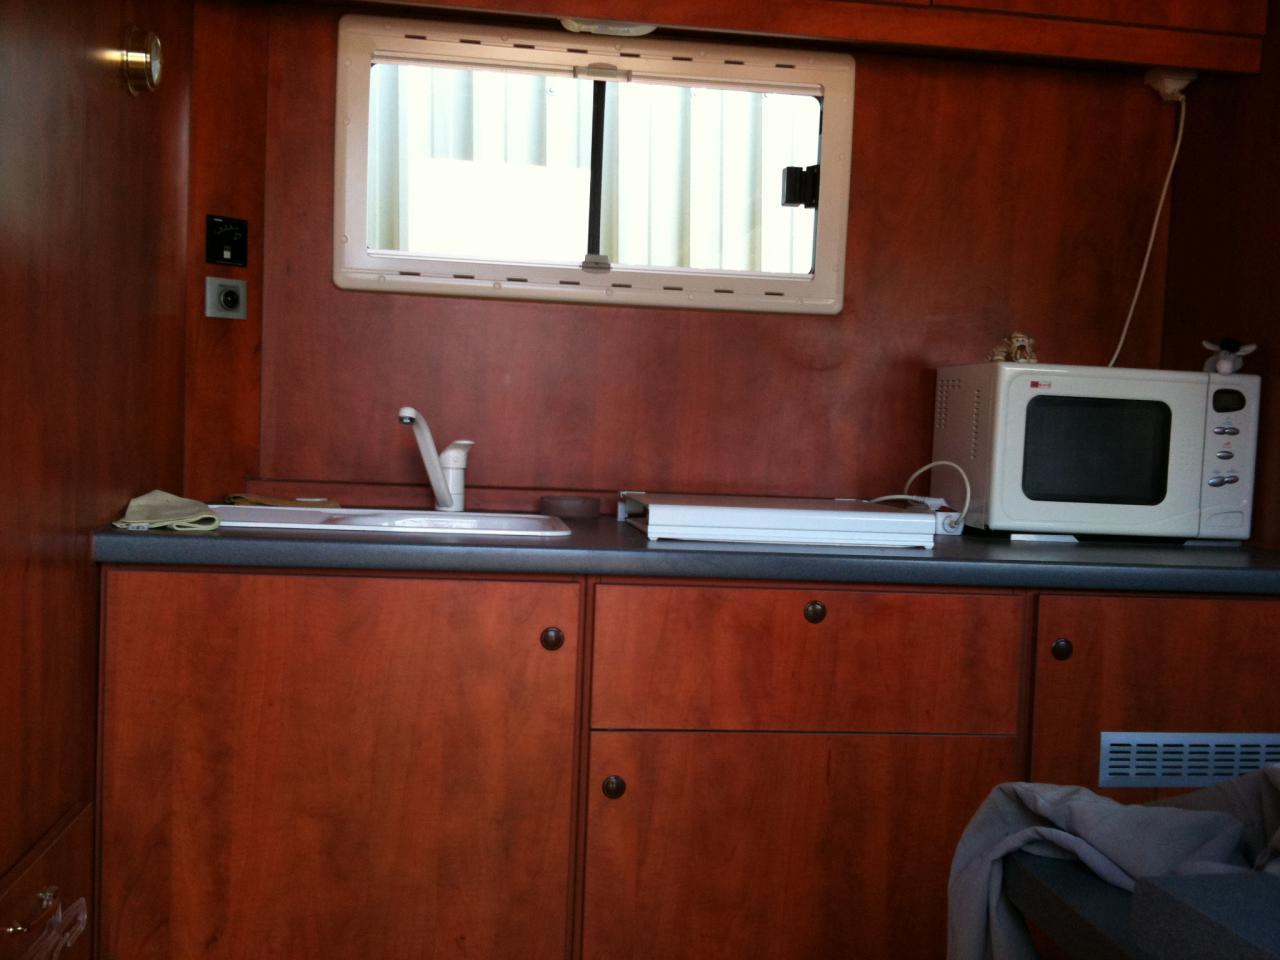 a vendre camion 4 chevaux avec home car 252203 acheter ce camion equirodi france. Black Bedroom Furniture Sets. Home Design Ideas